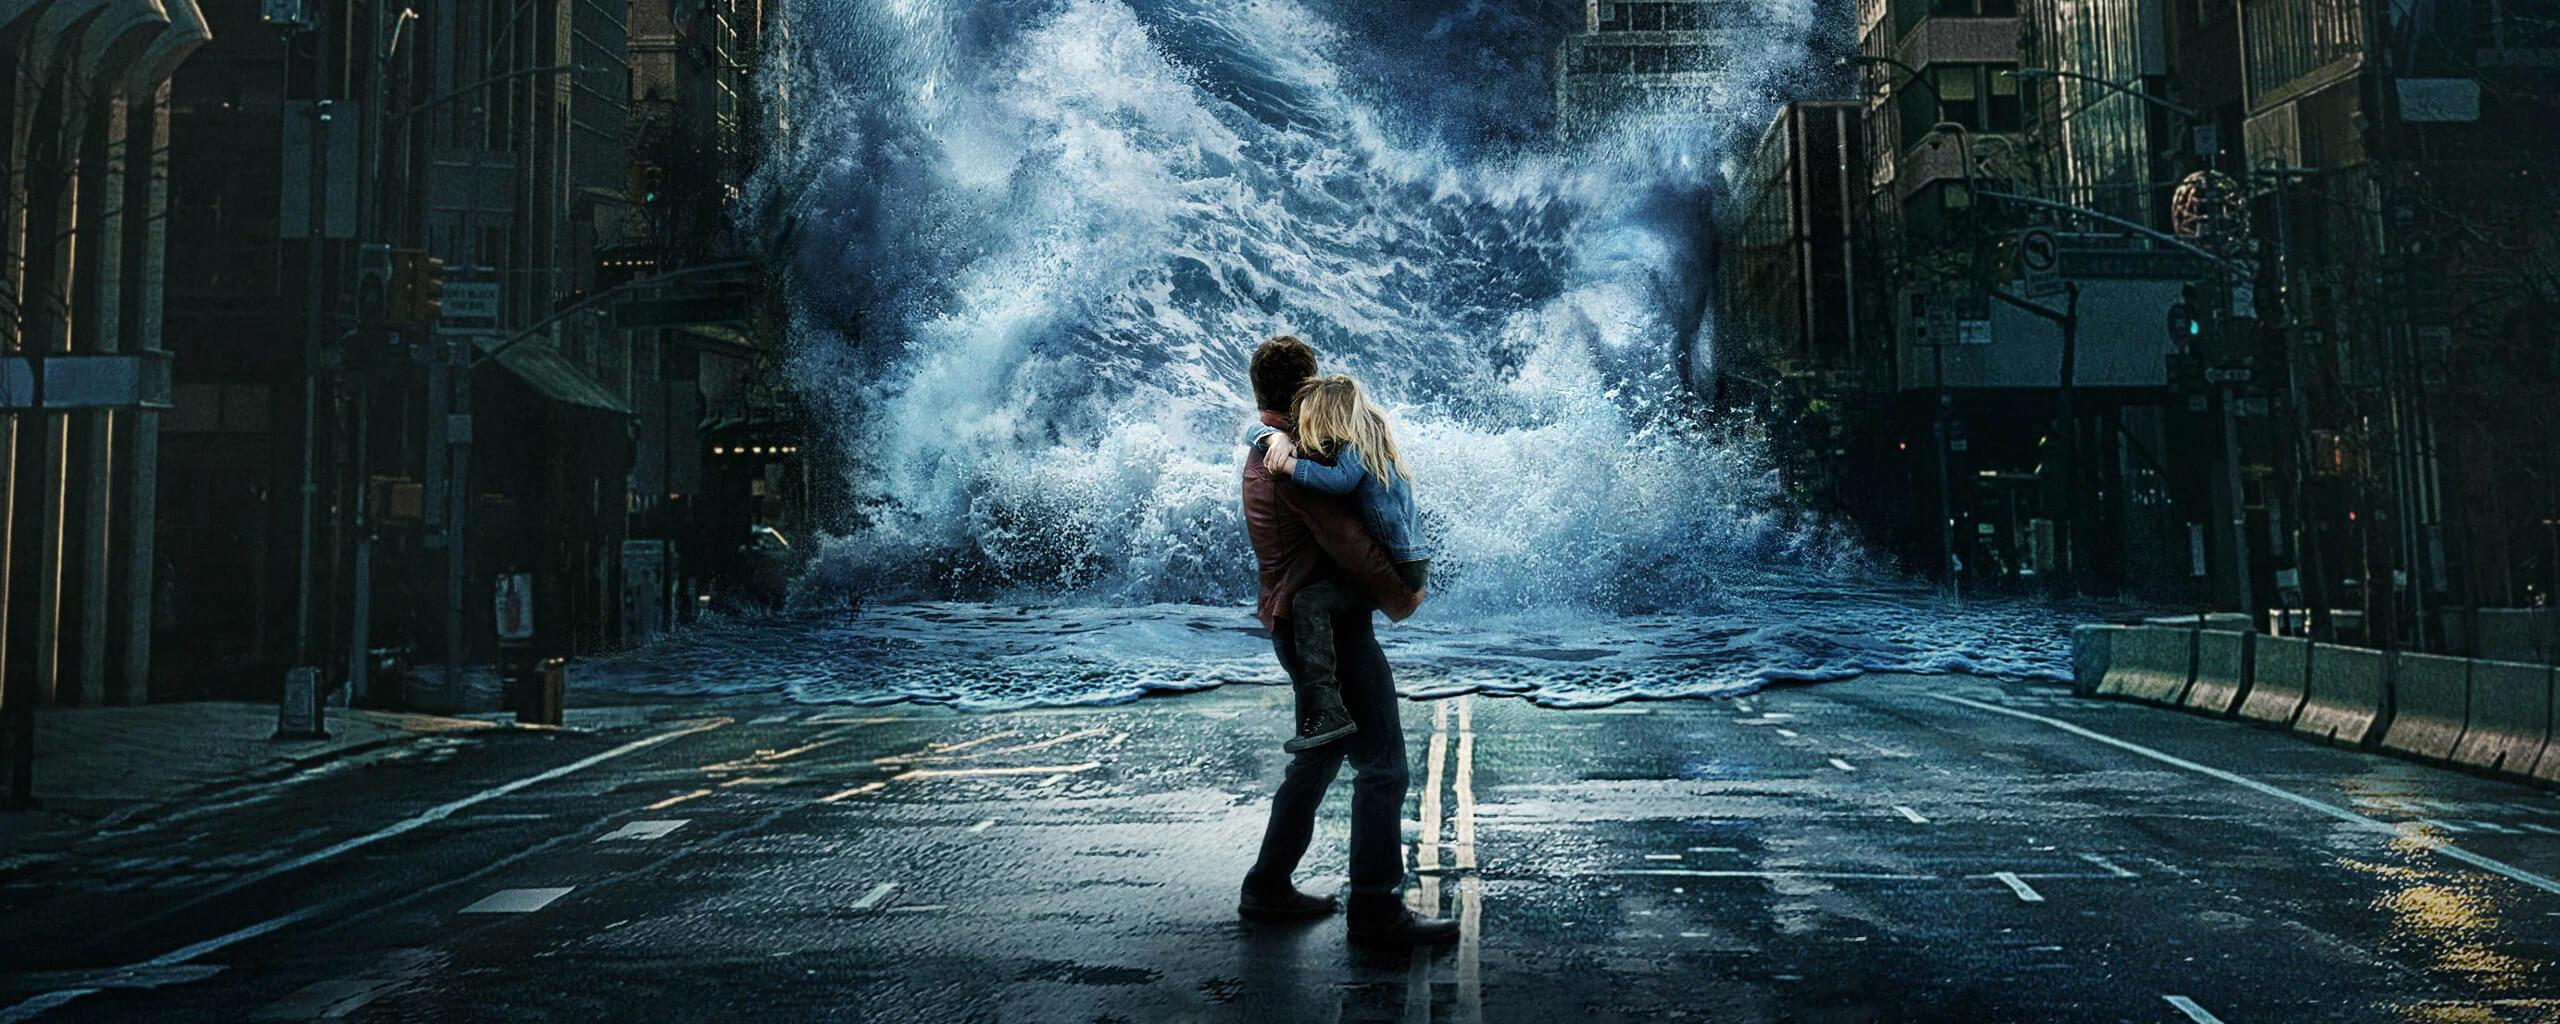 59283_geostorm-2017-movie_2560x1024